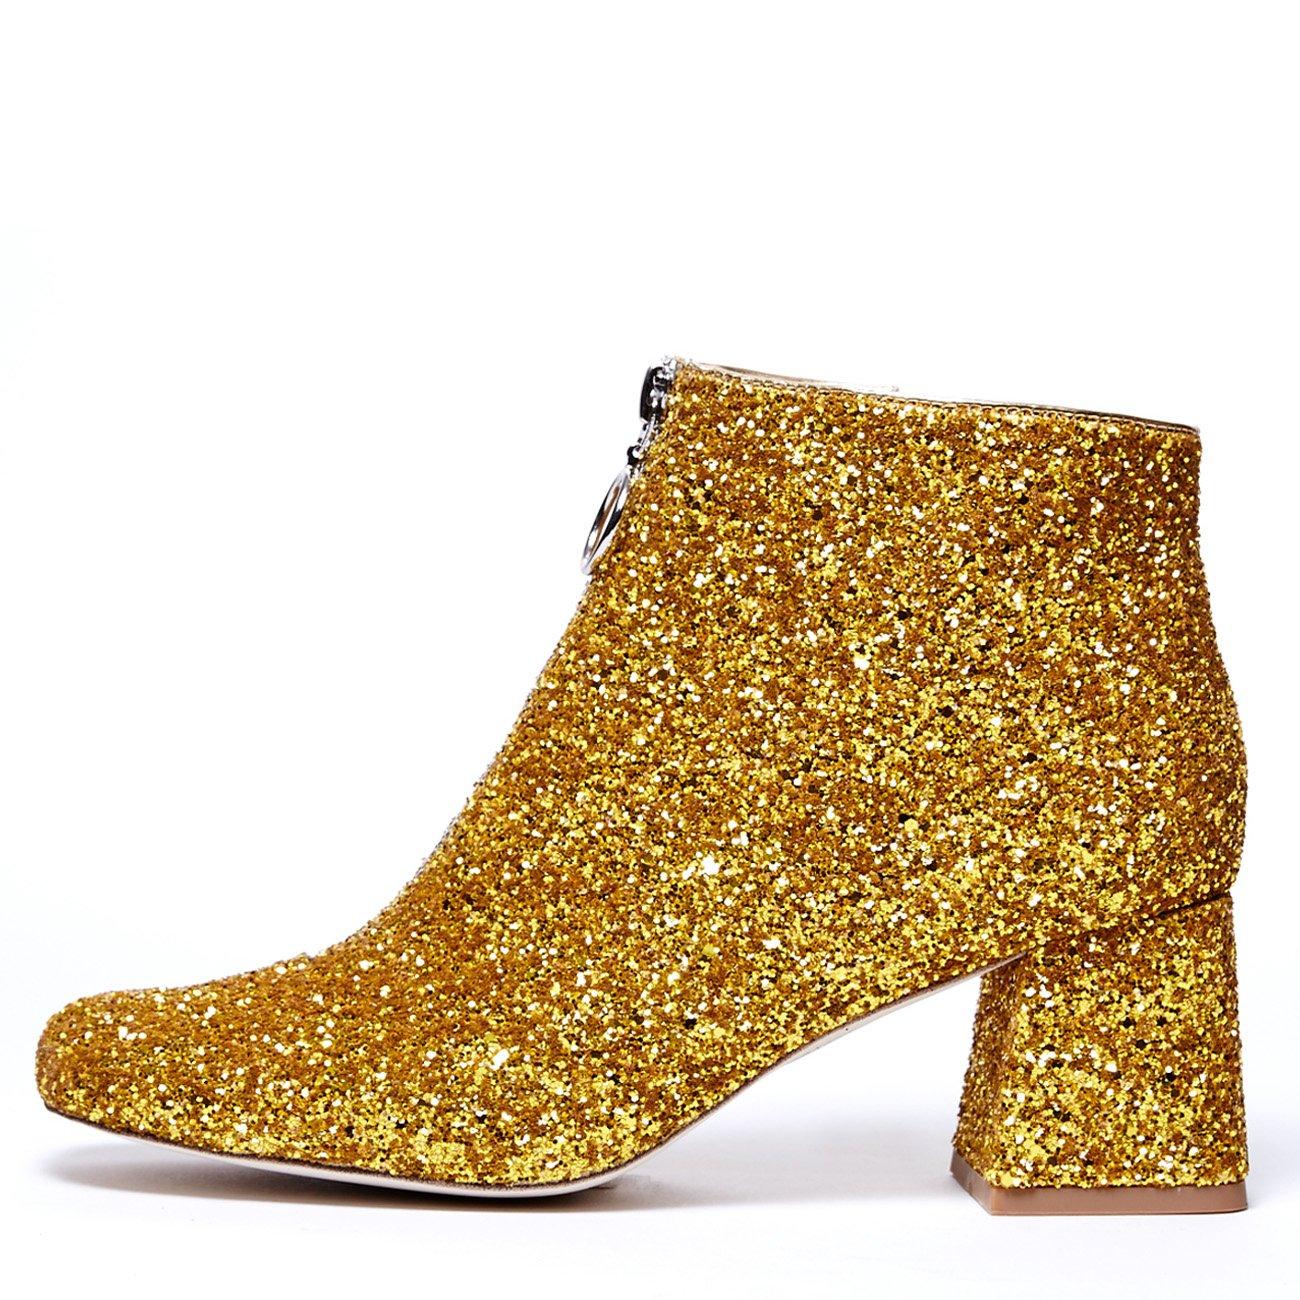 Jeffrey Campbell 'Bossanova' gold glitter boot,7